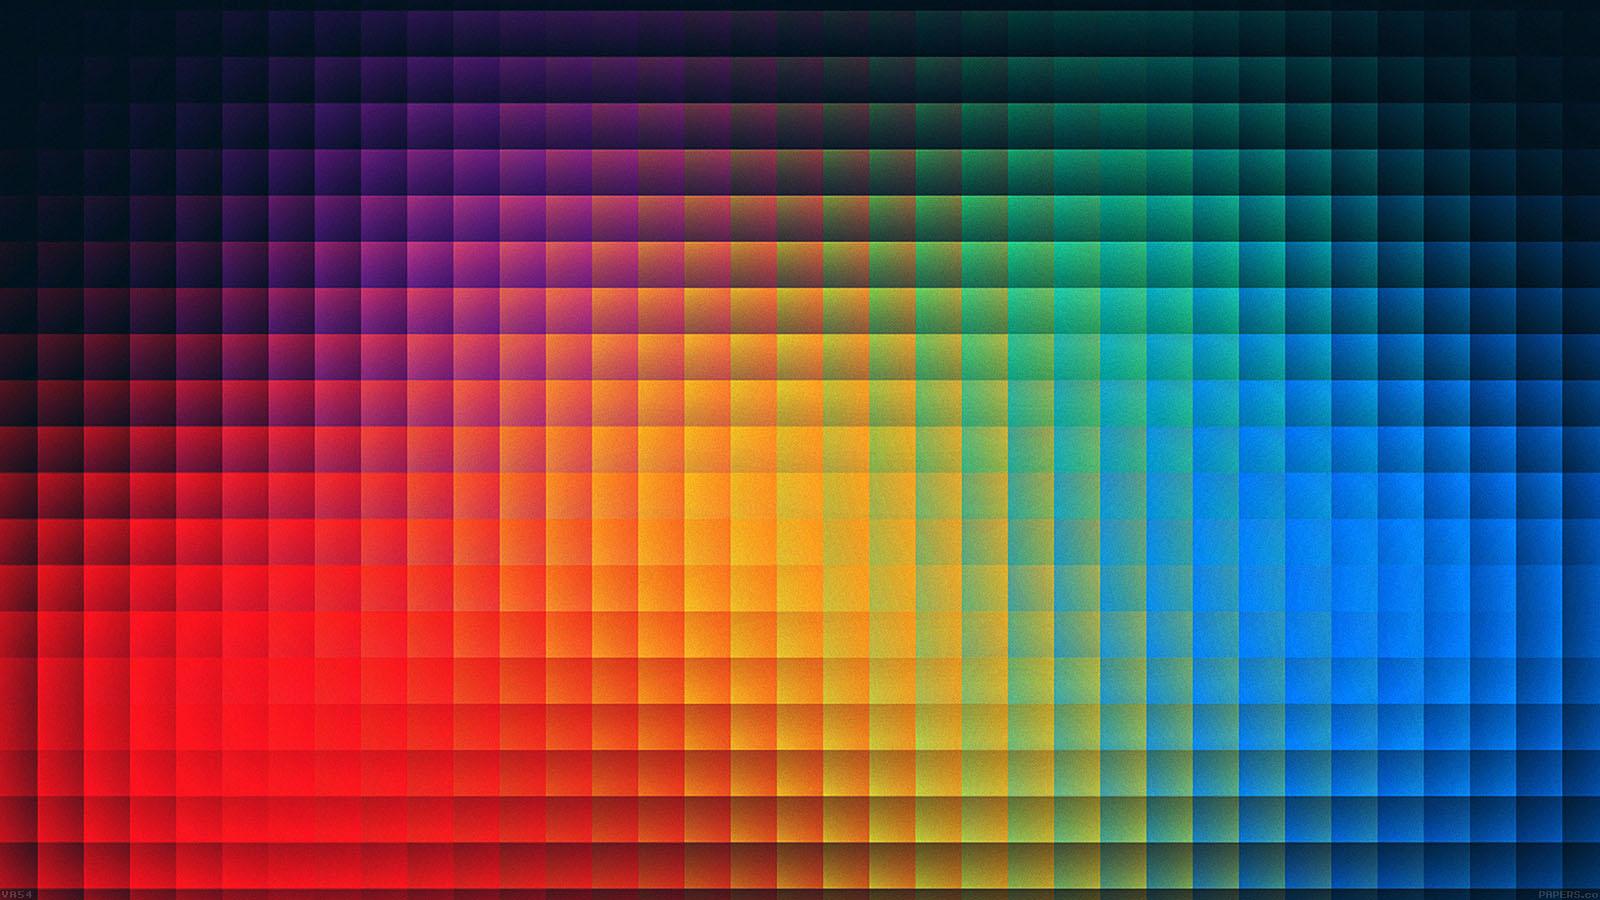 va54-rainbow-pixels-pattern